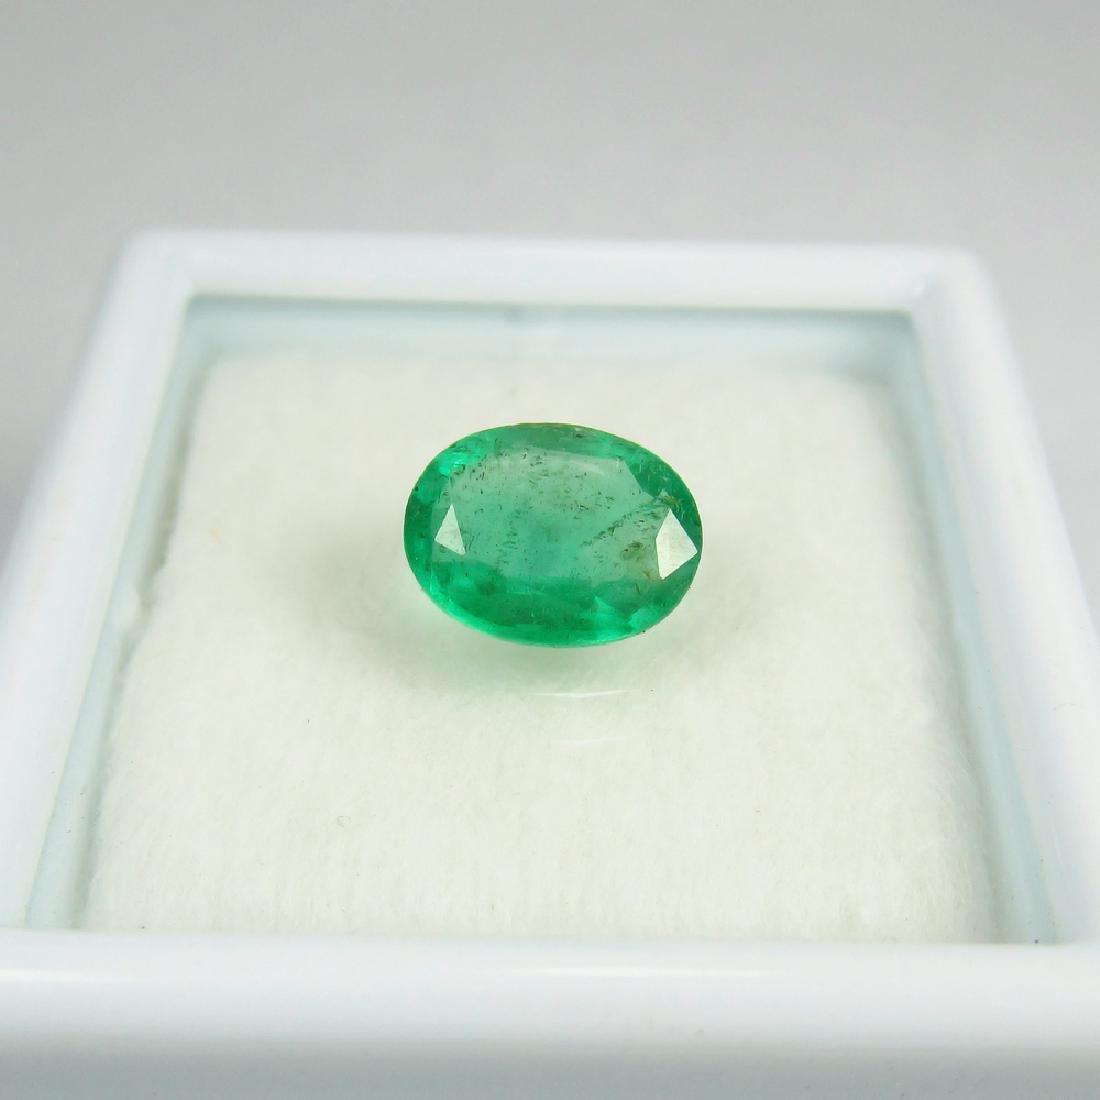 IGI Certified 1.11 Ct Genuine Zambian Emerald Good - 3